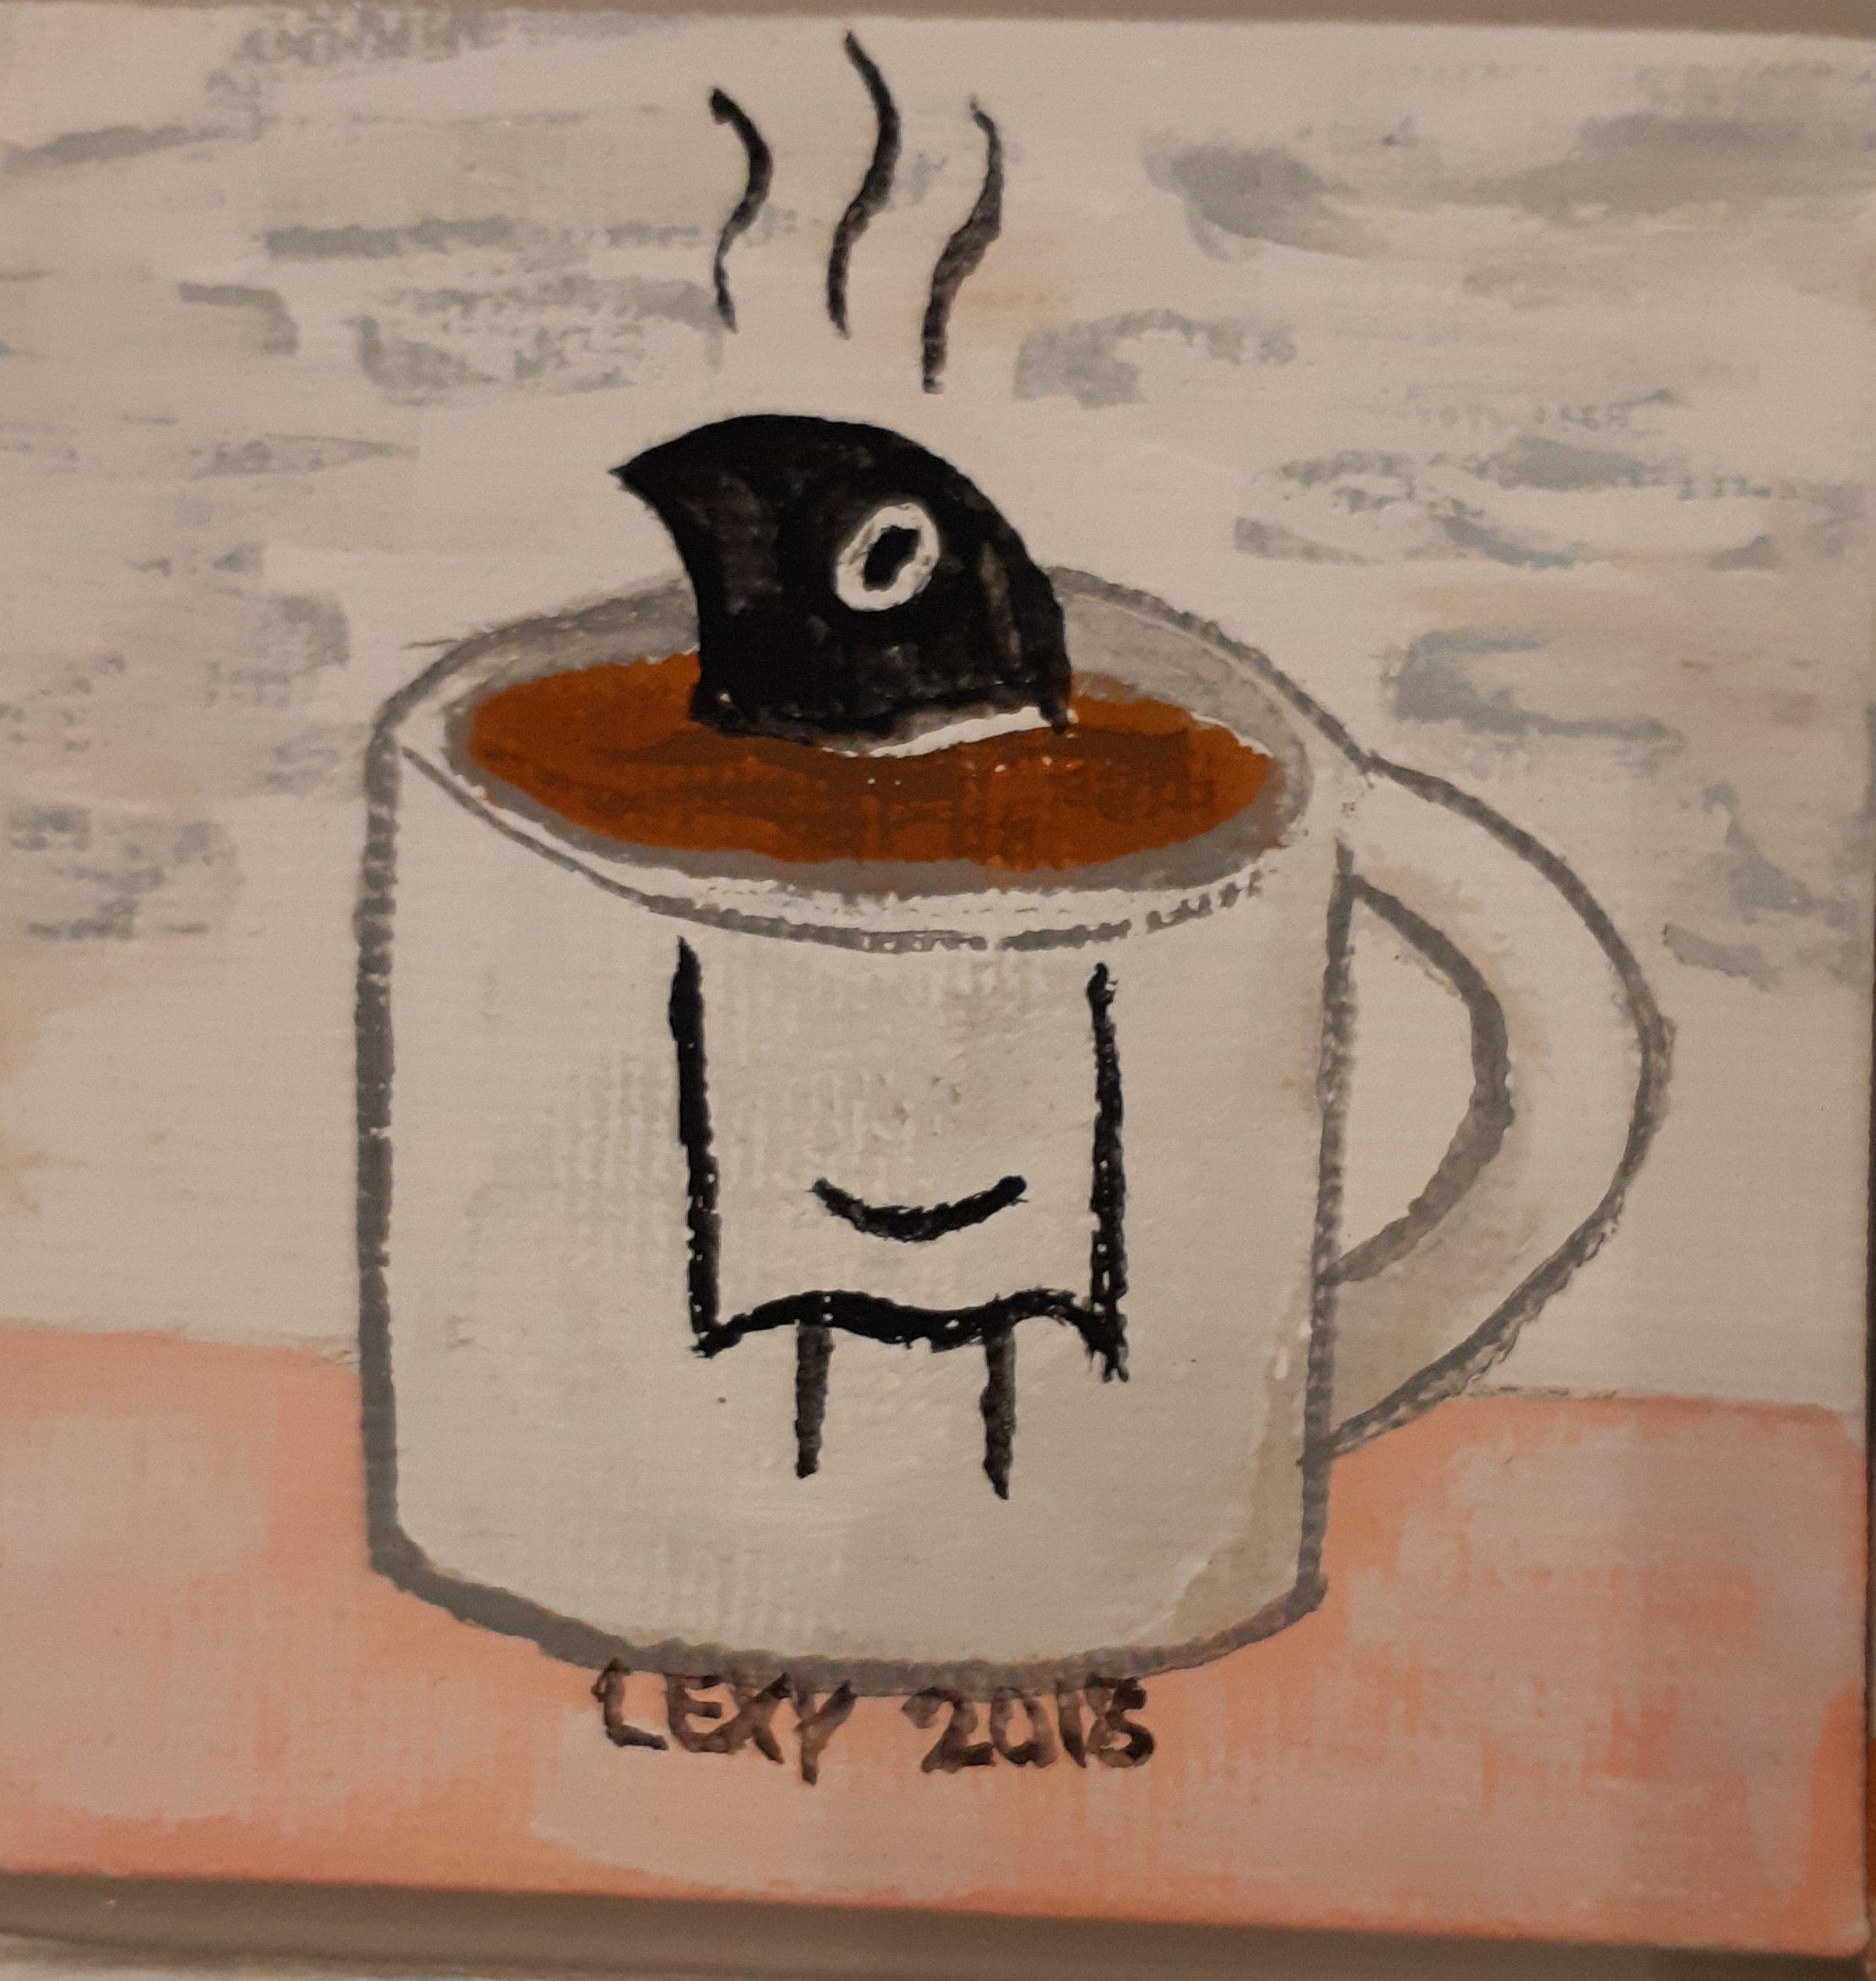 A gouache-acryl painting depicting a burnt bird in a mug of hot chocolate.